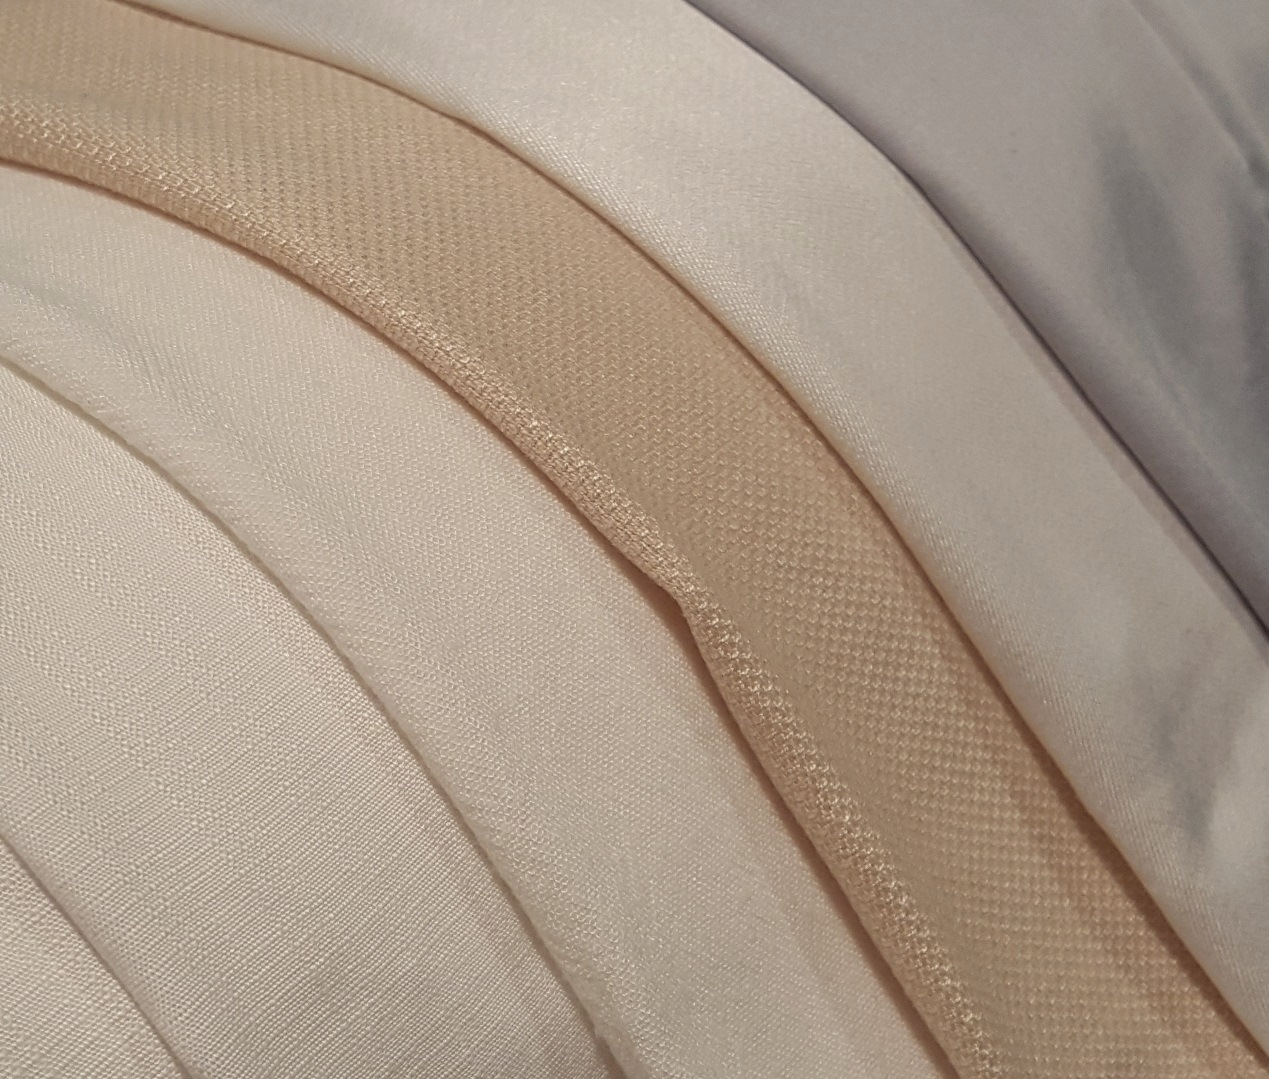 Natural Fabrics Natural Upholstery Fabric